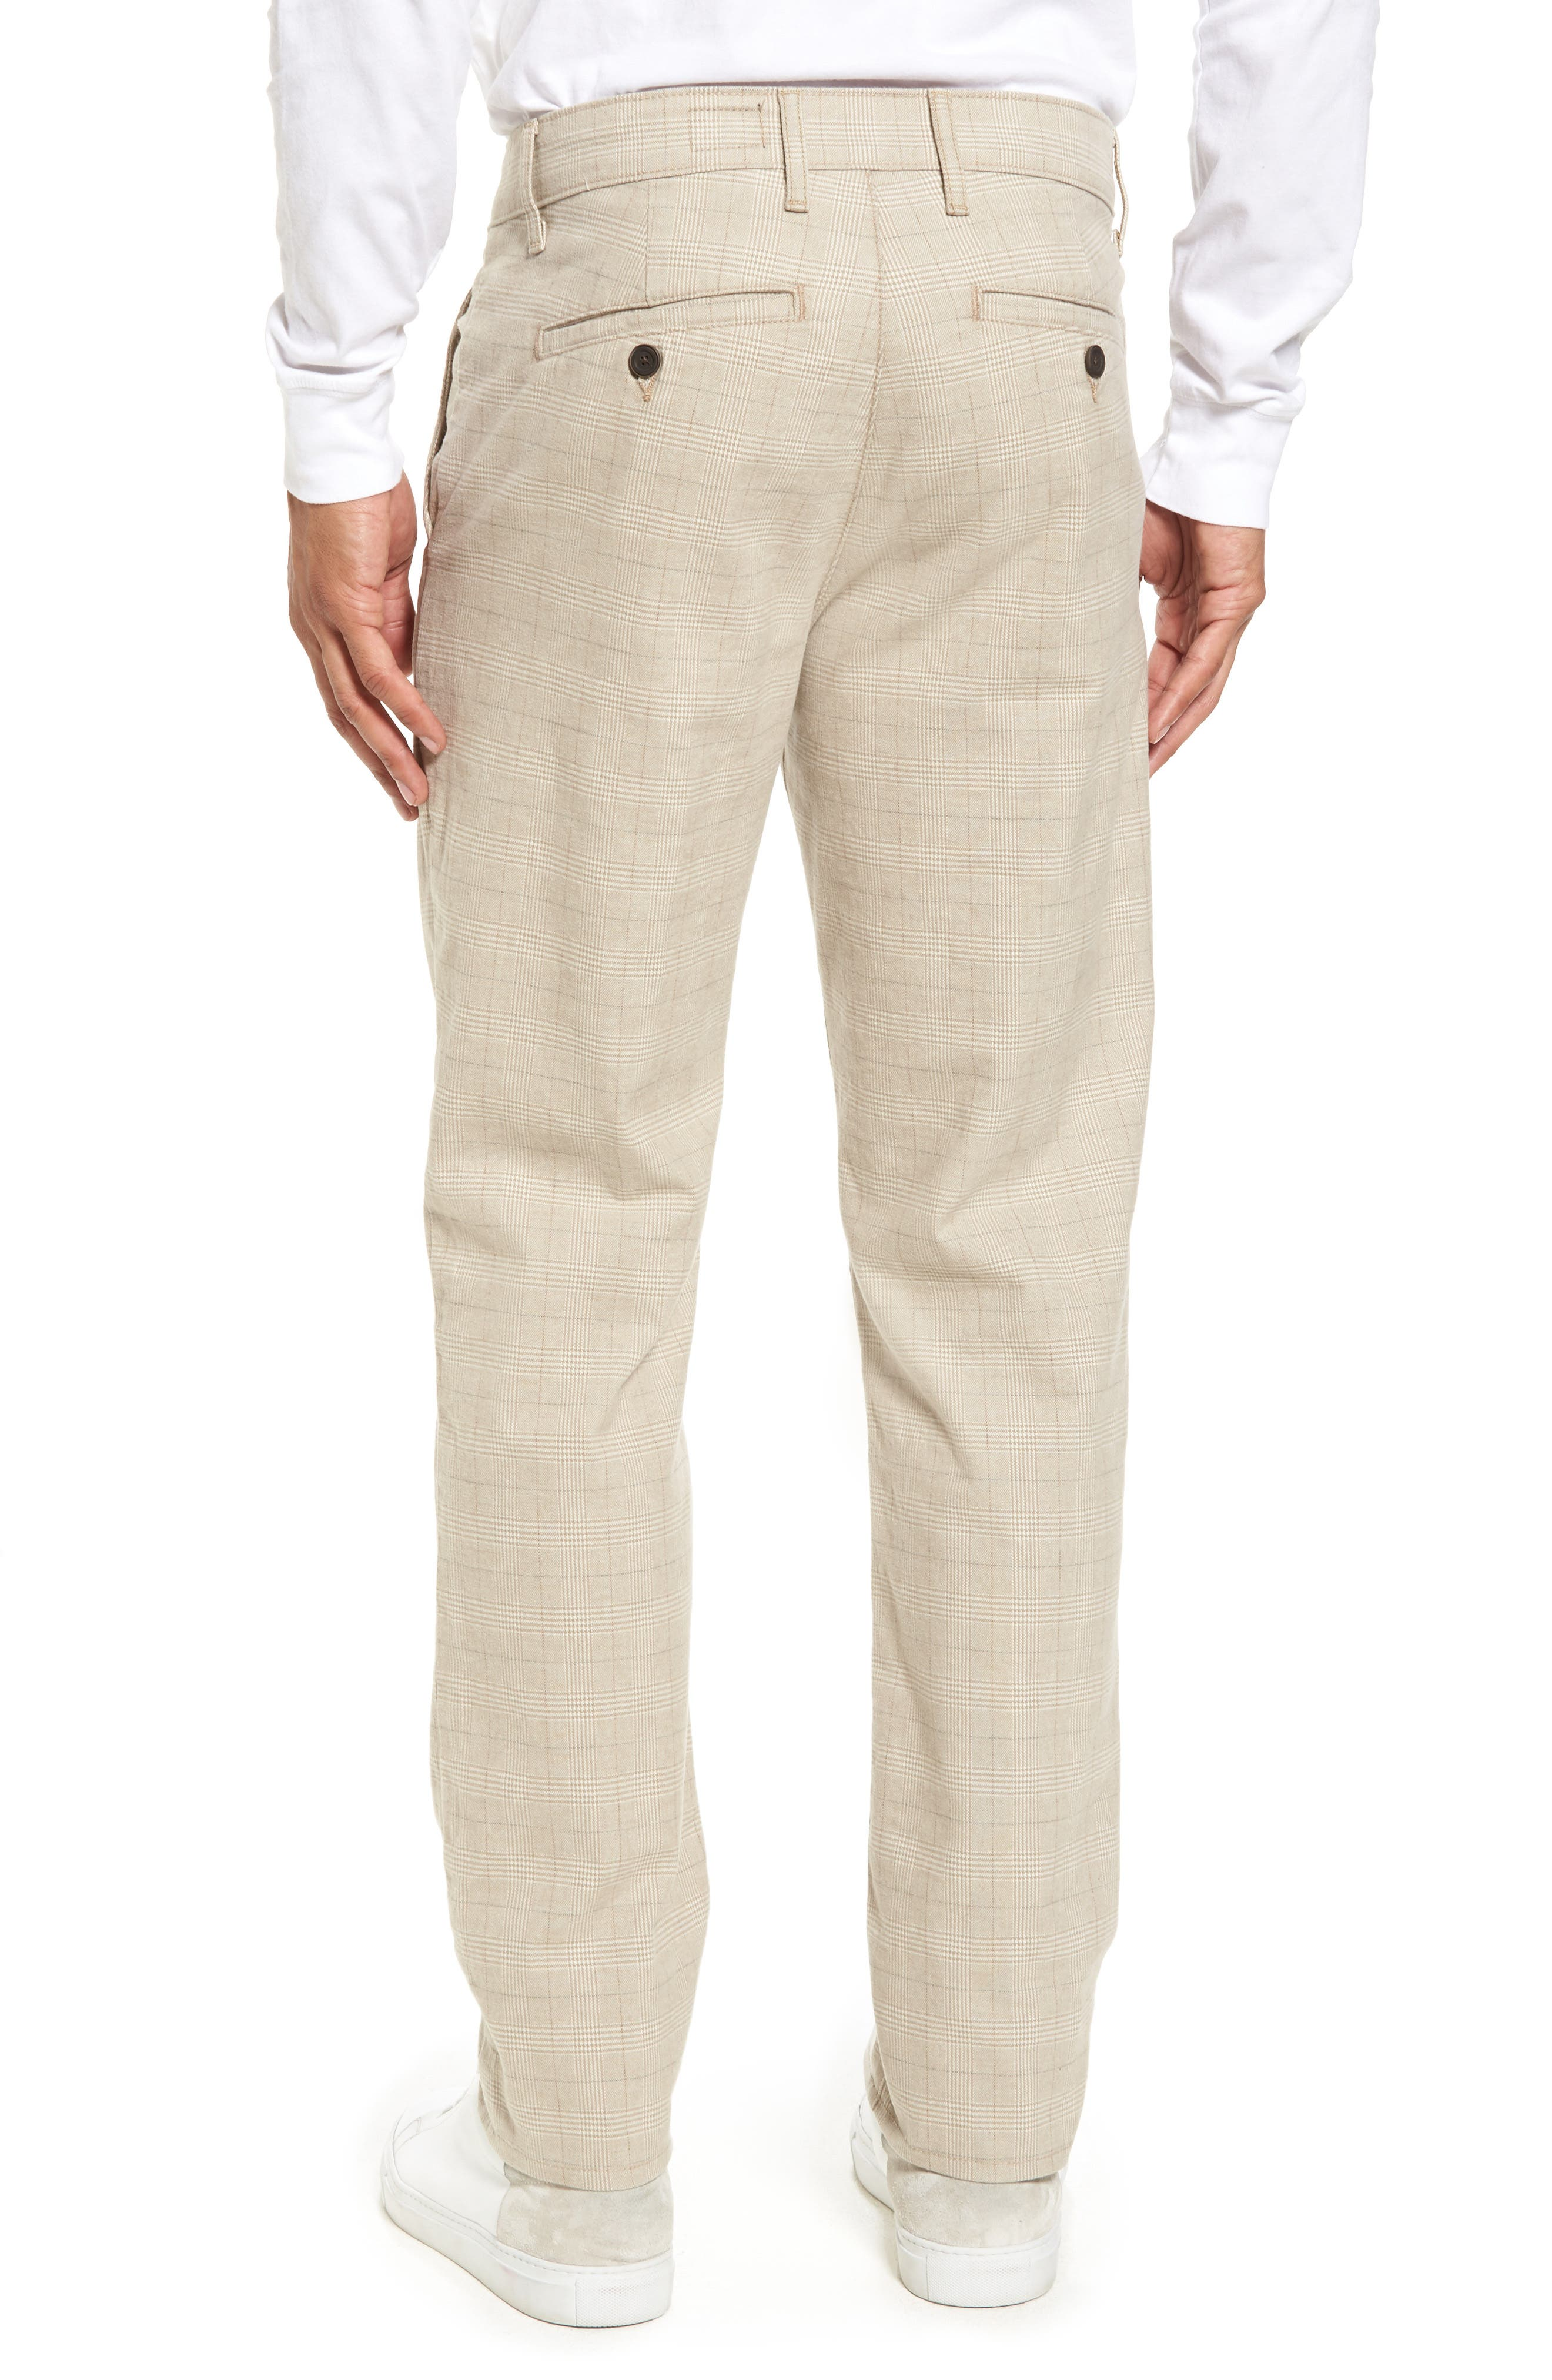 Marshall Slim Fit Pants,                             Alternate thumbnail 2, color,                             Silica Sand